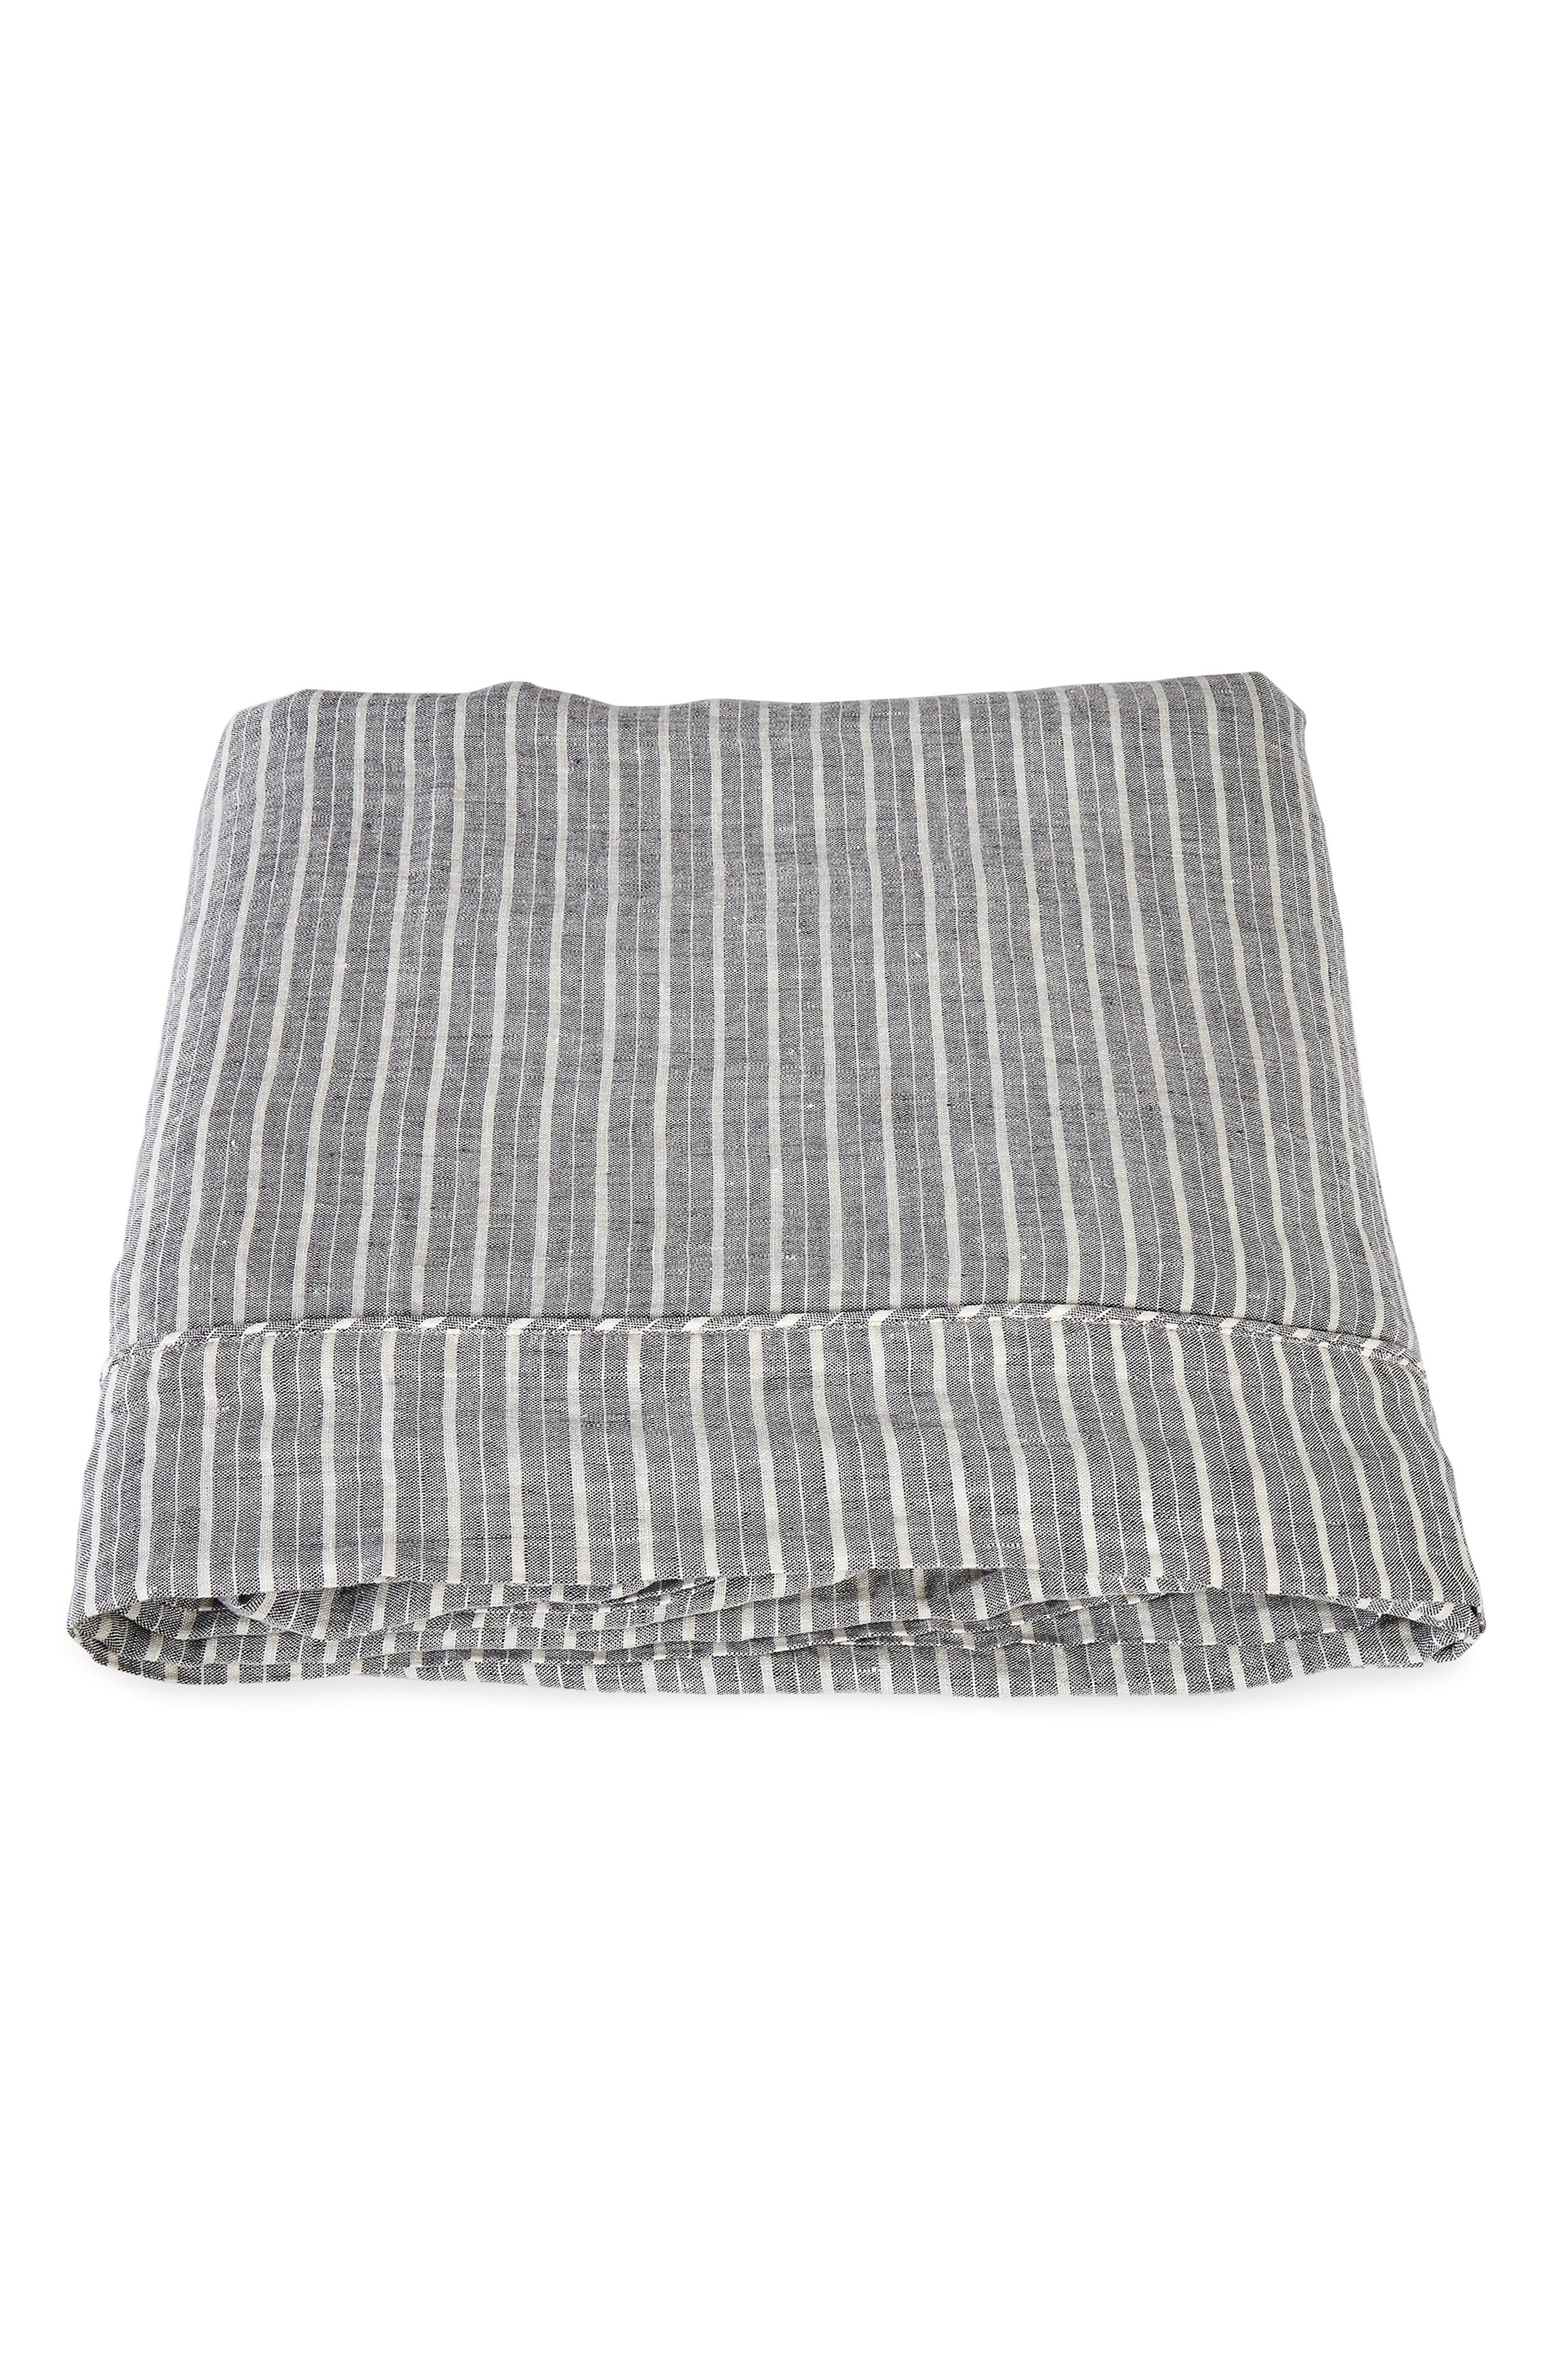 Tristen Linen Flat Sheet, Main, color, ANTHRACITE/ WHITE